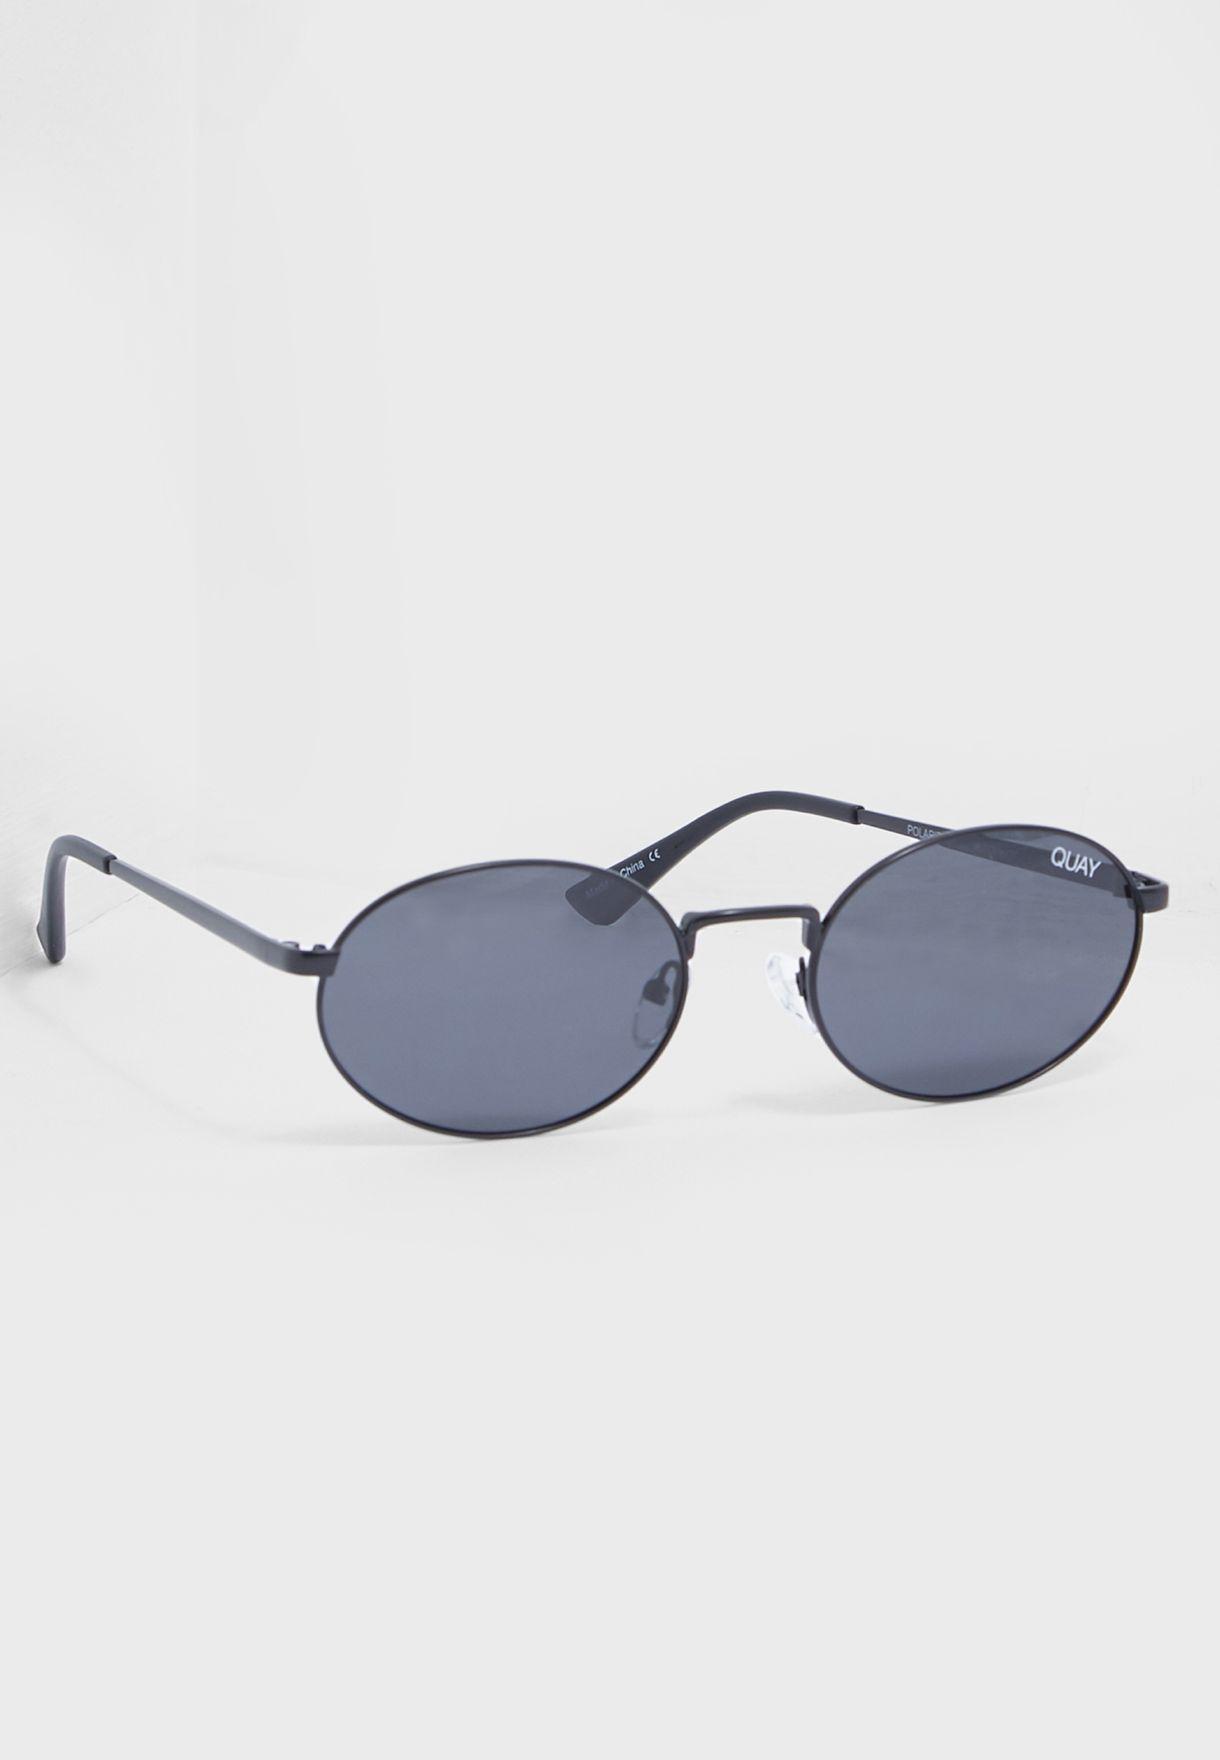 eb2e44dde Shop Quay Australia black Autopilot Sunglasses QM-000500-BLK/SMK for ...